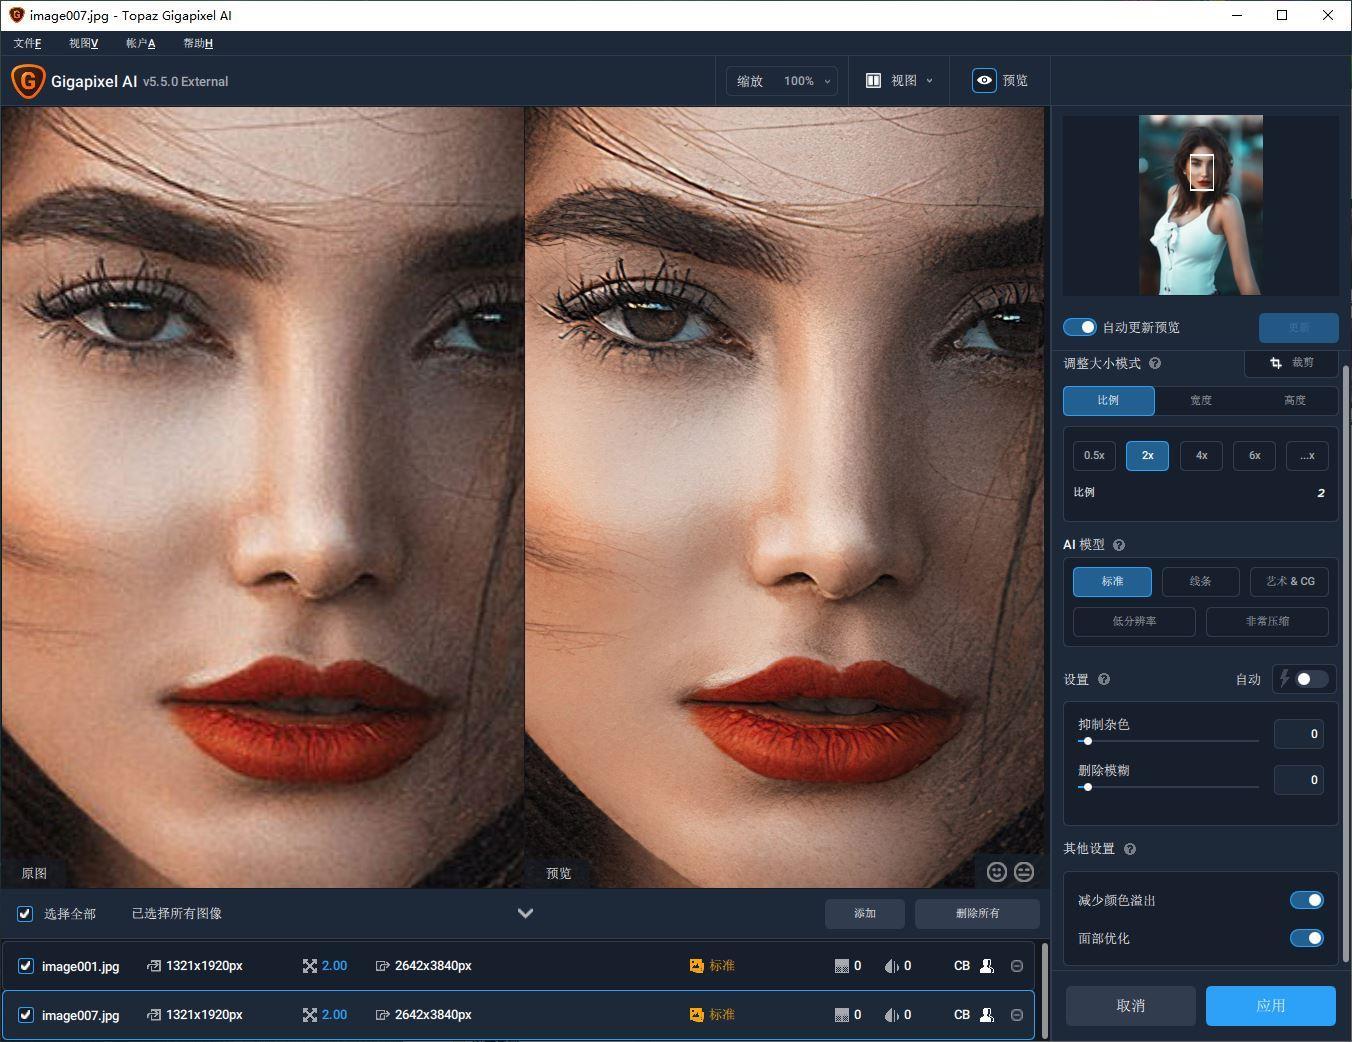 VIP资源-智能图片无损放大工具 Topaz Gigapixel AI 5.5.1 Win 中文汉化版(1)